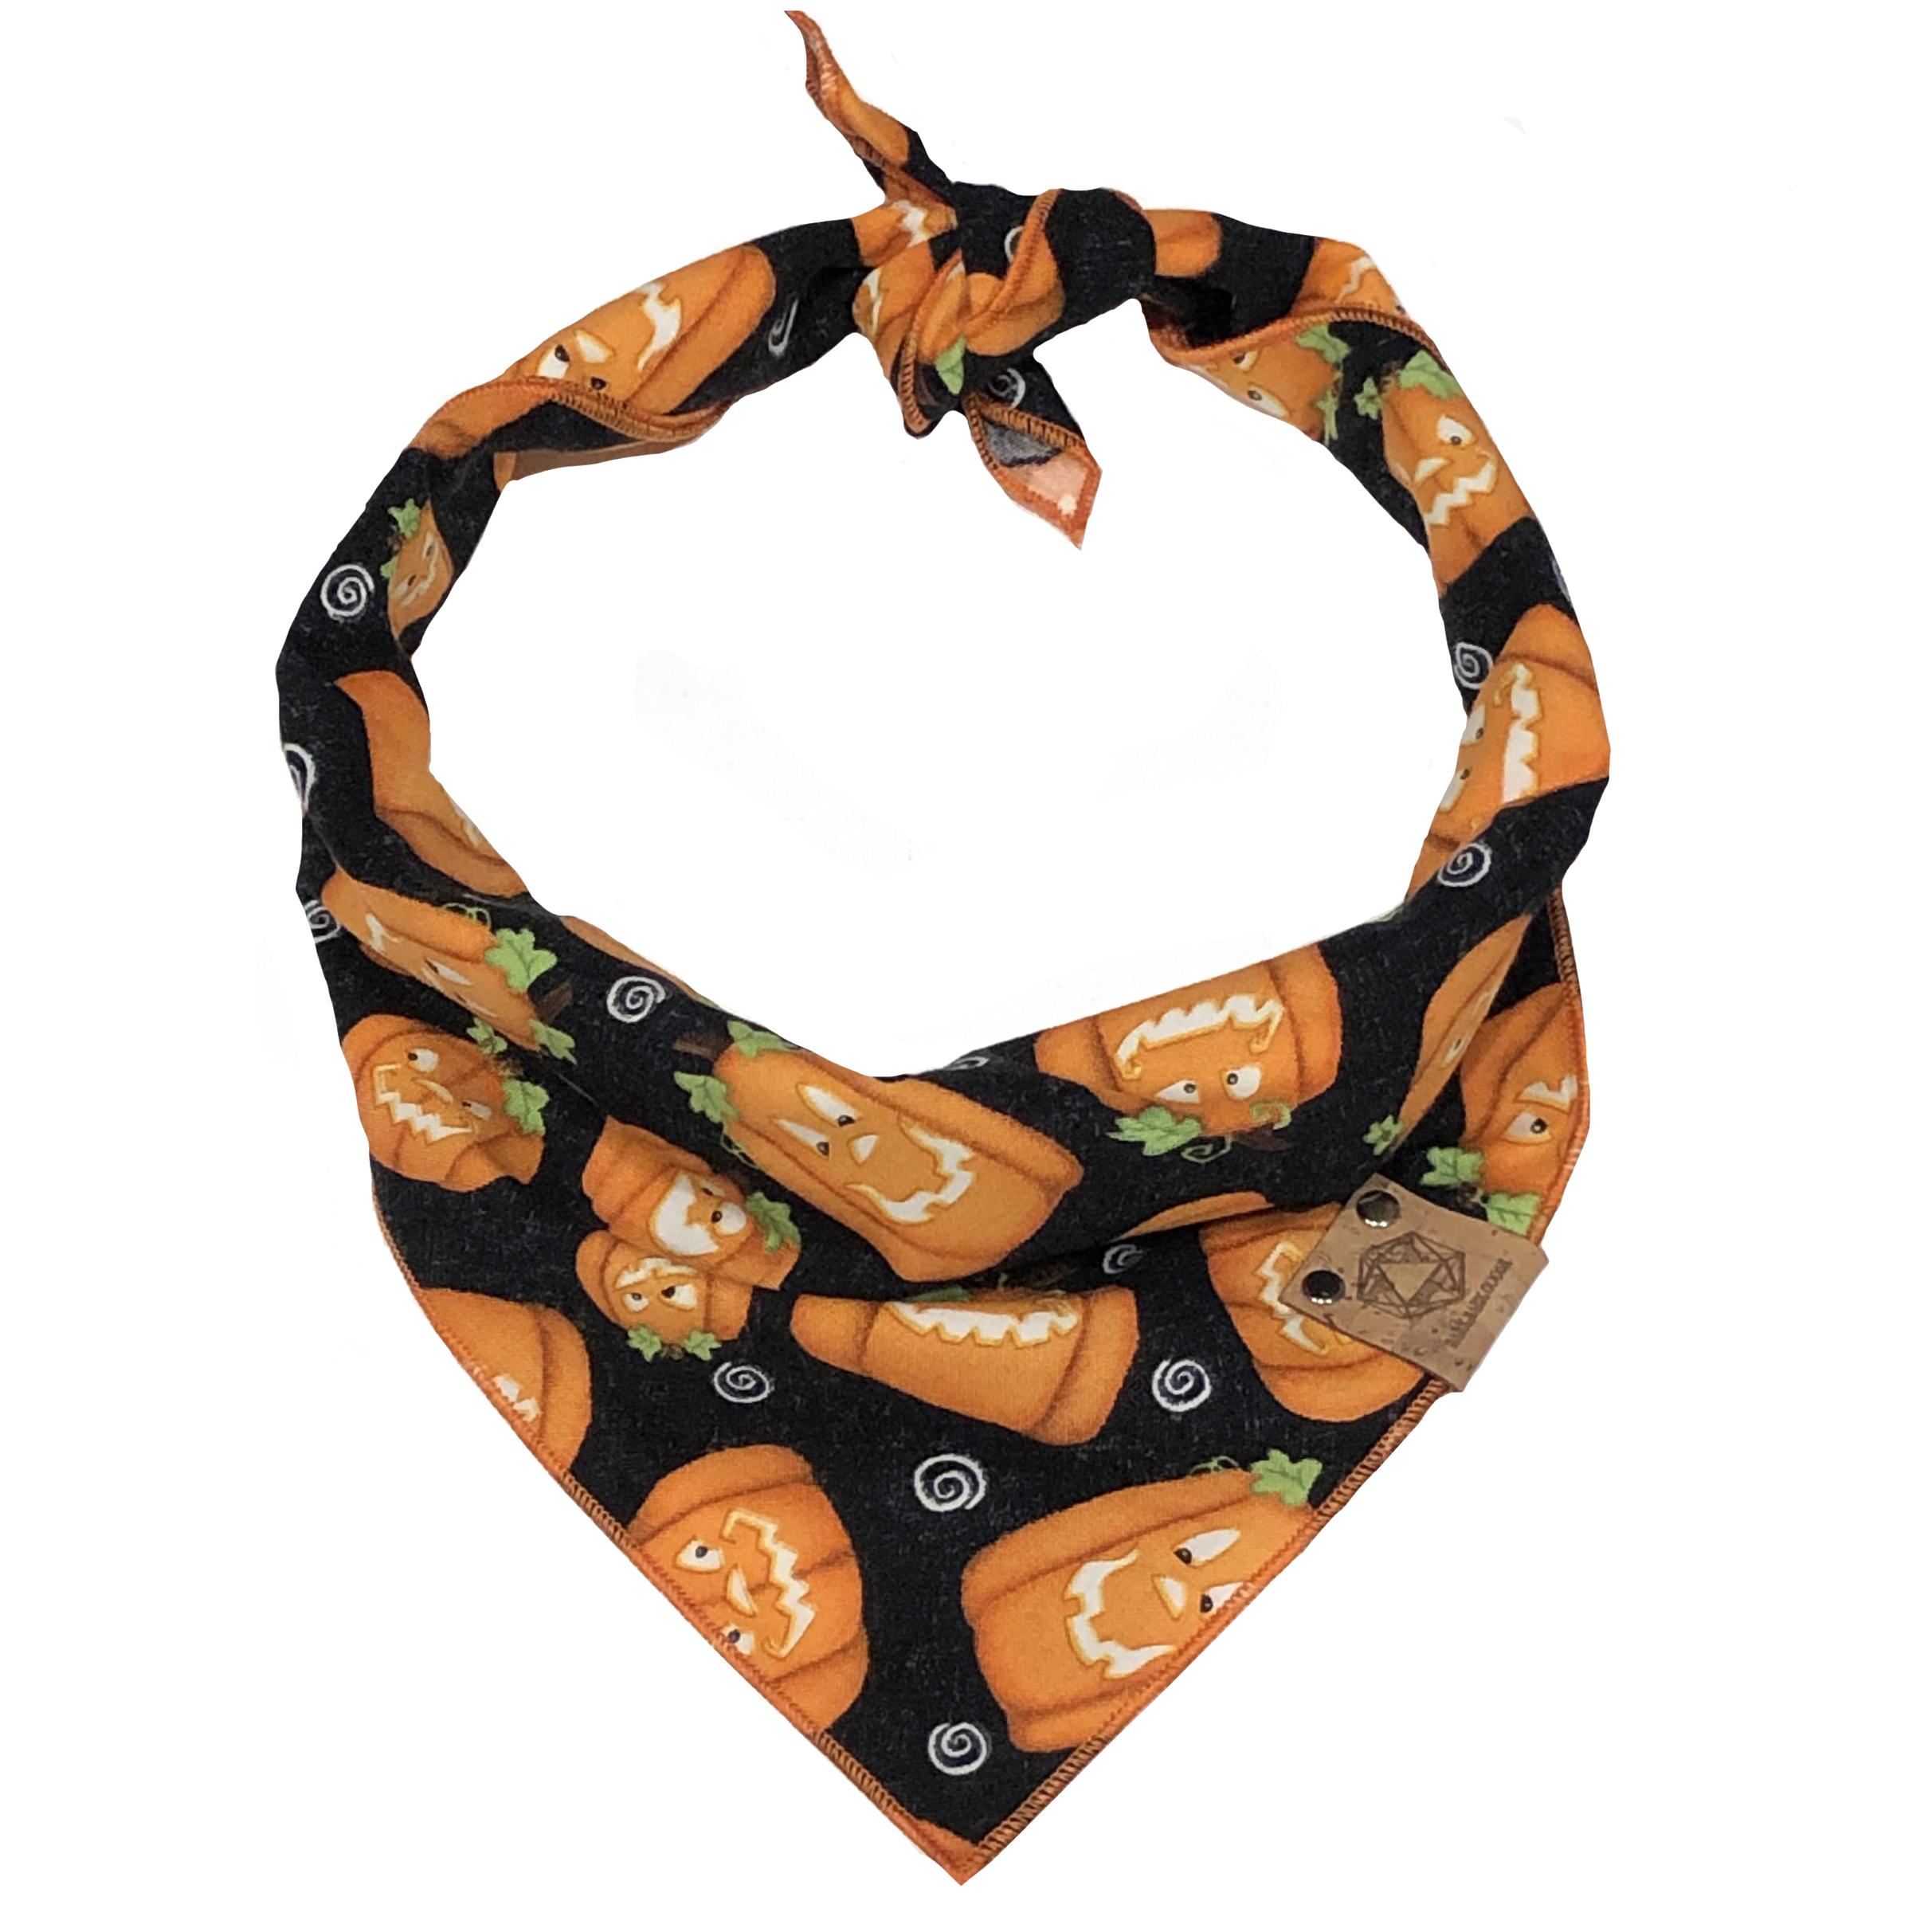 pumpkins glow in the dark halloween dog bandana.jpg